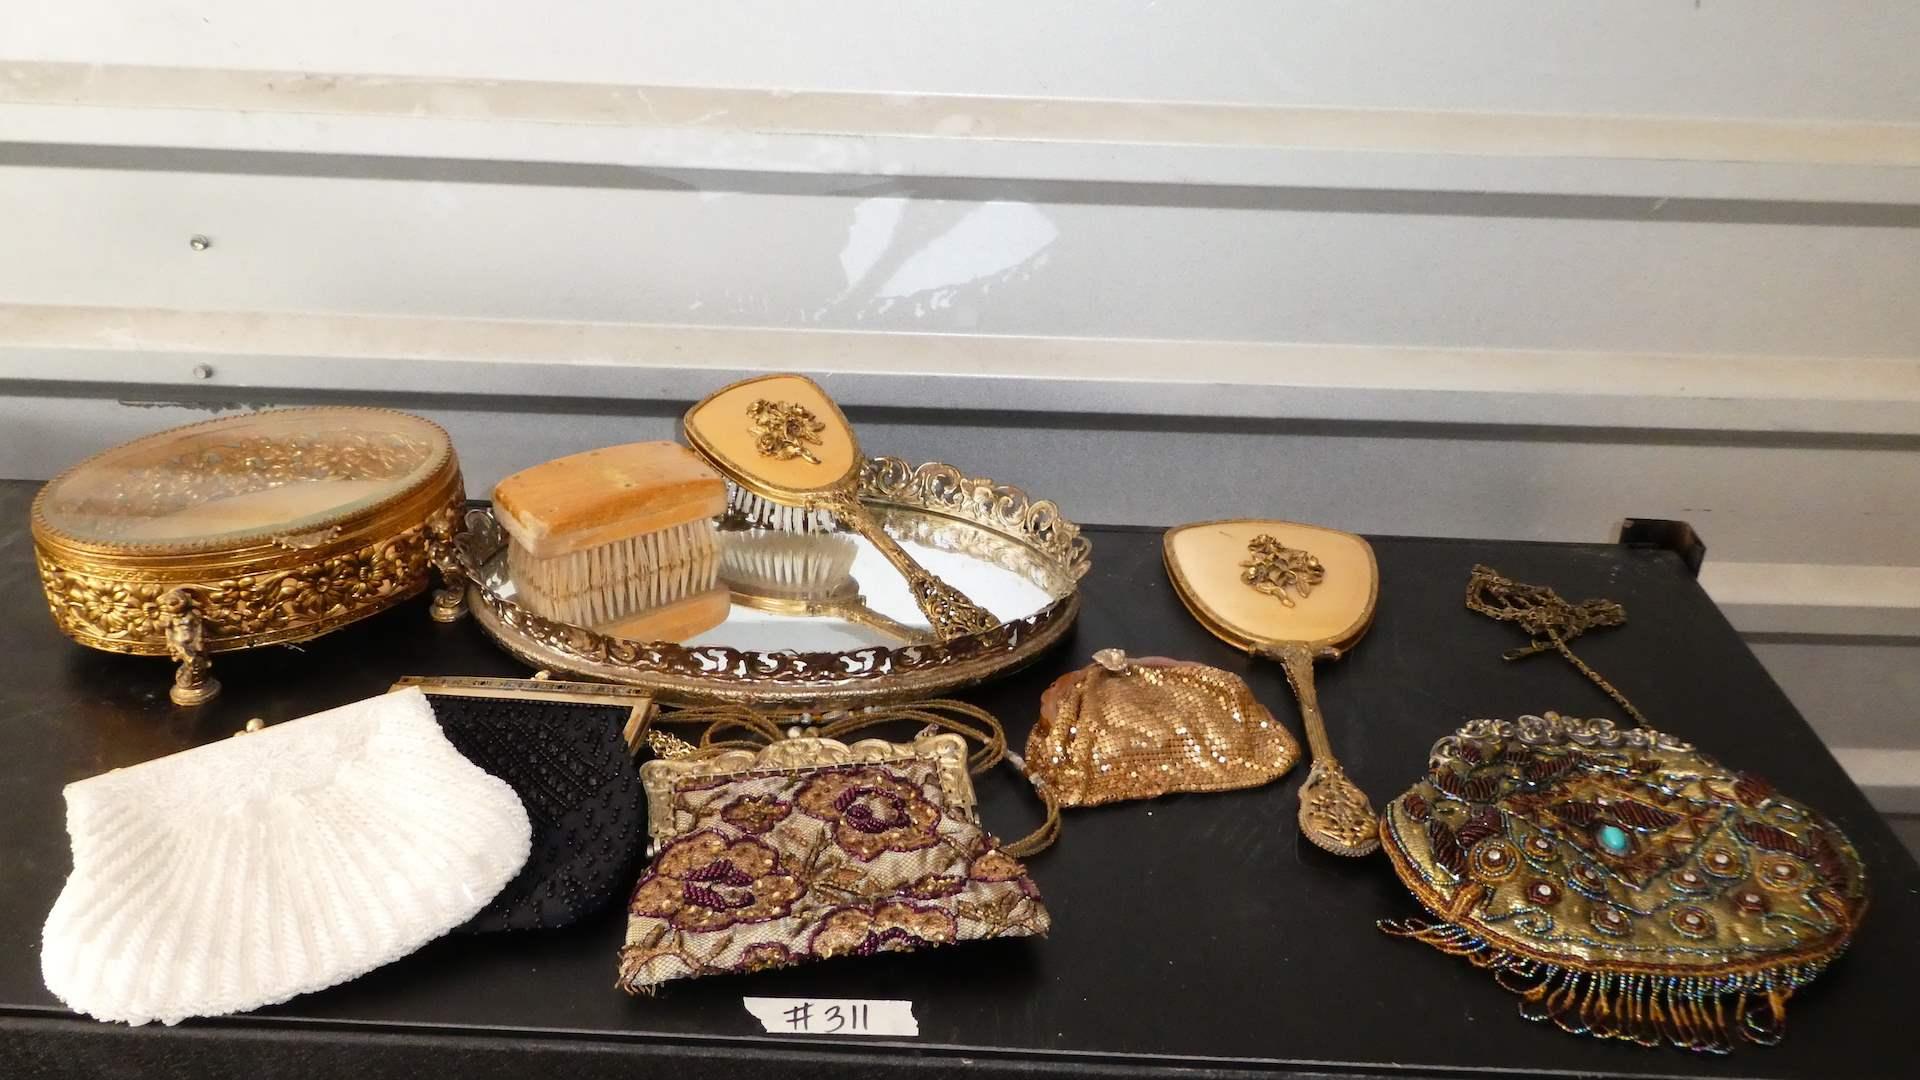 Lot # 311 -Adorable Vintage Vanity Set, Vintage Beaded Purses & Vintage Gold Chainmail Coin Purse (main image)